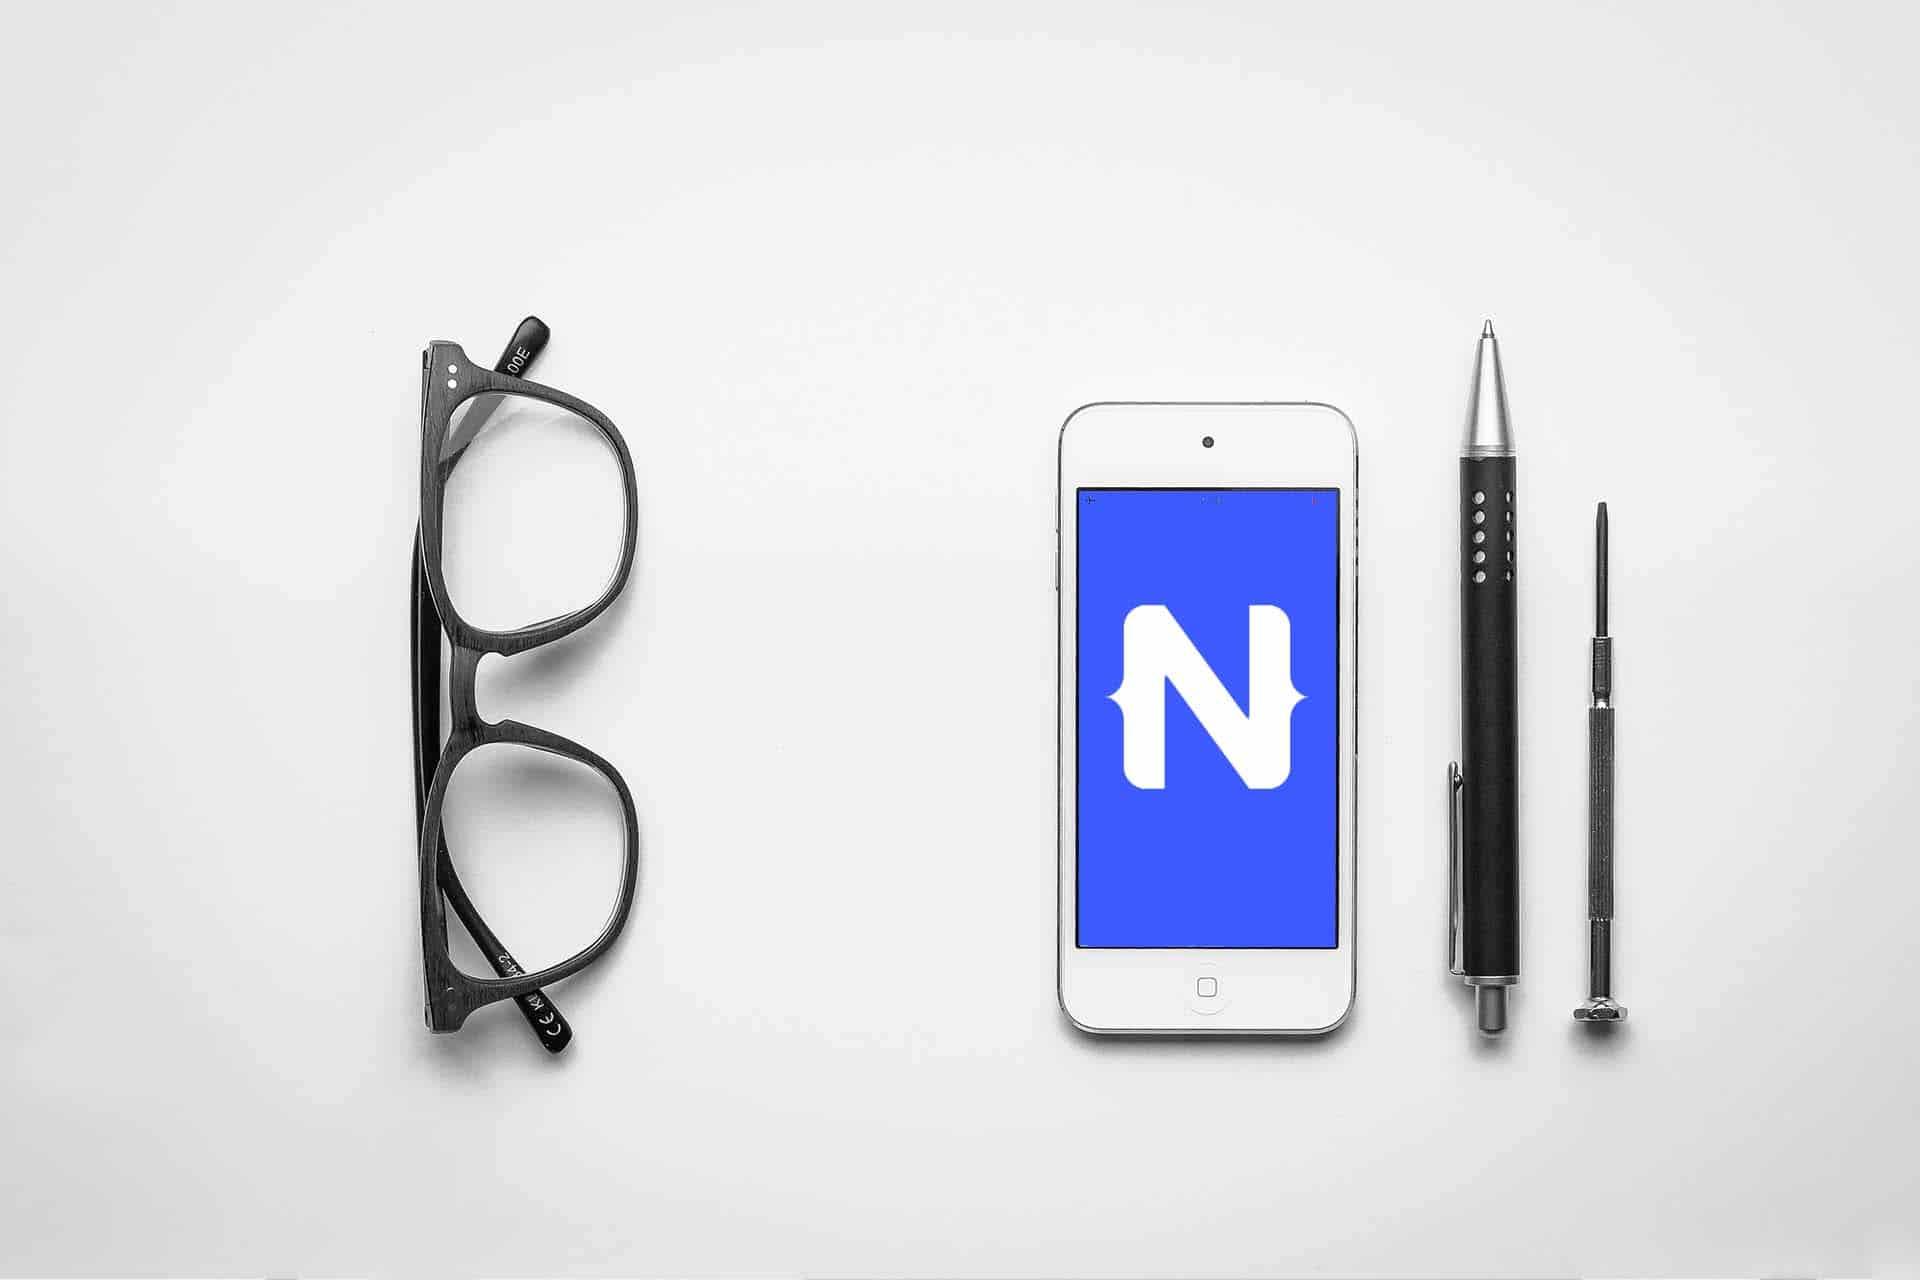 t2informatik Blog: App development with NativeScript